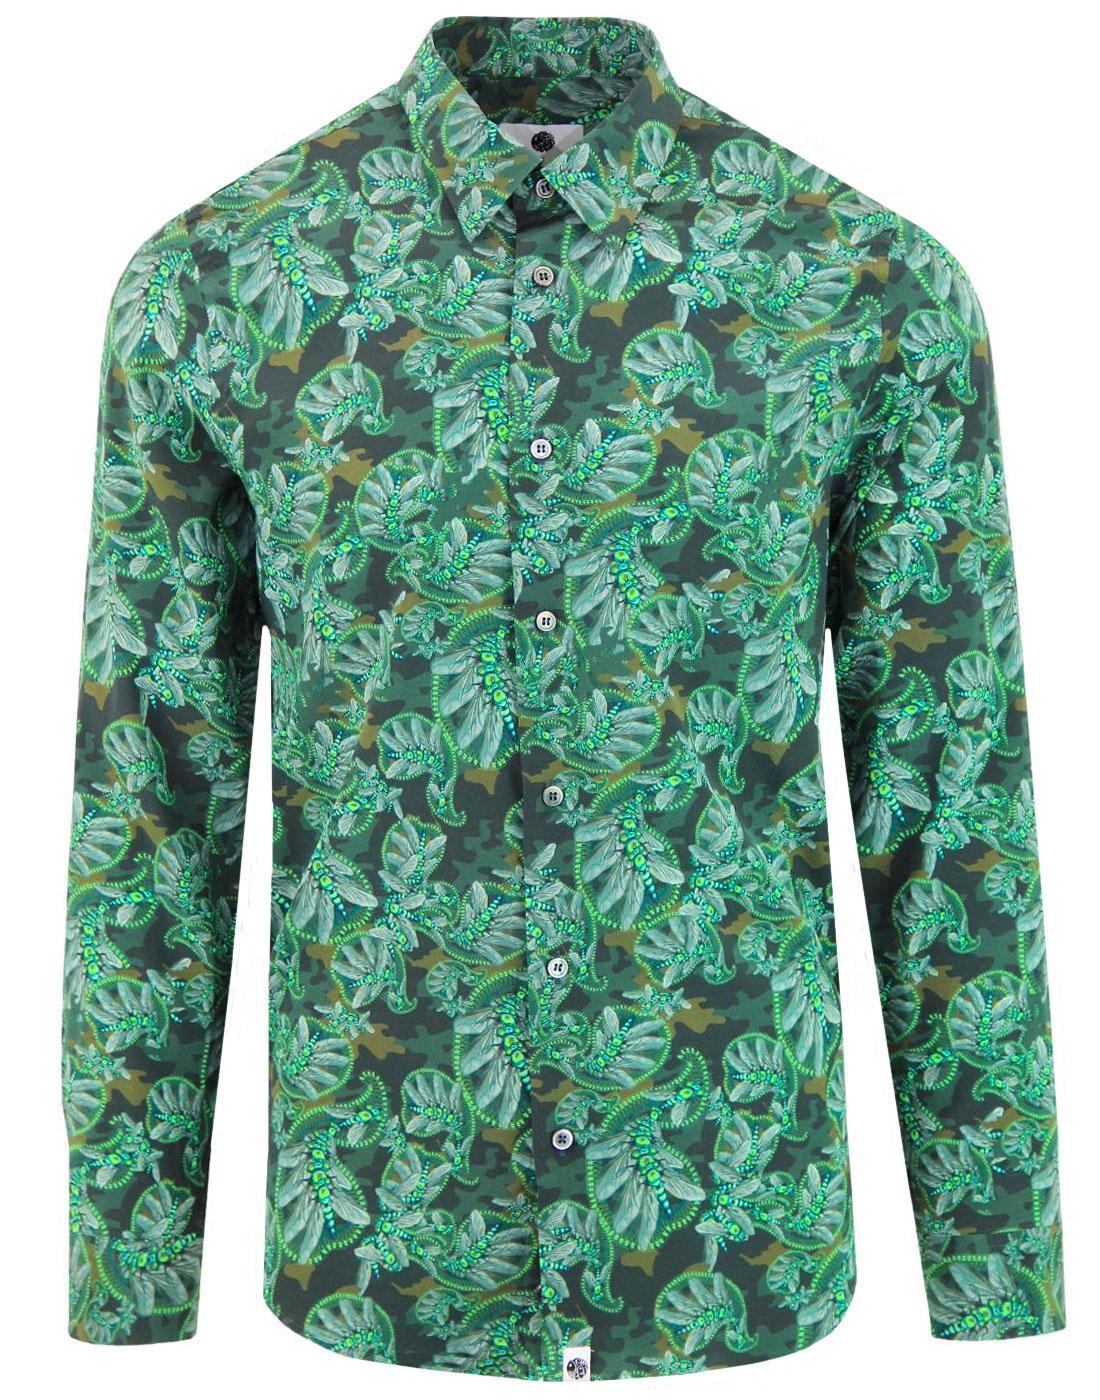 Toria PRETTY GREEN X KATIE EARY Mod Paisley Shirt